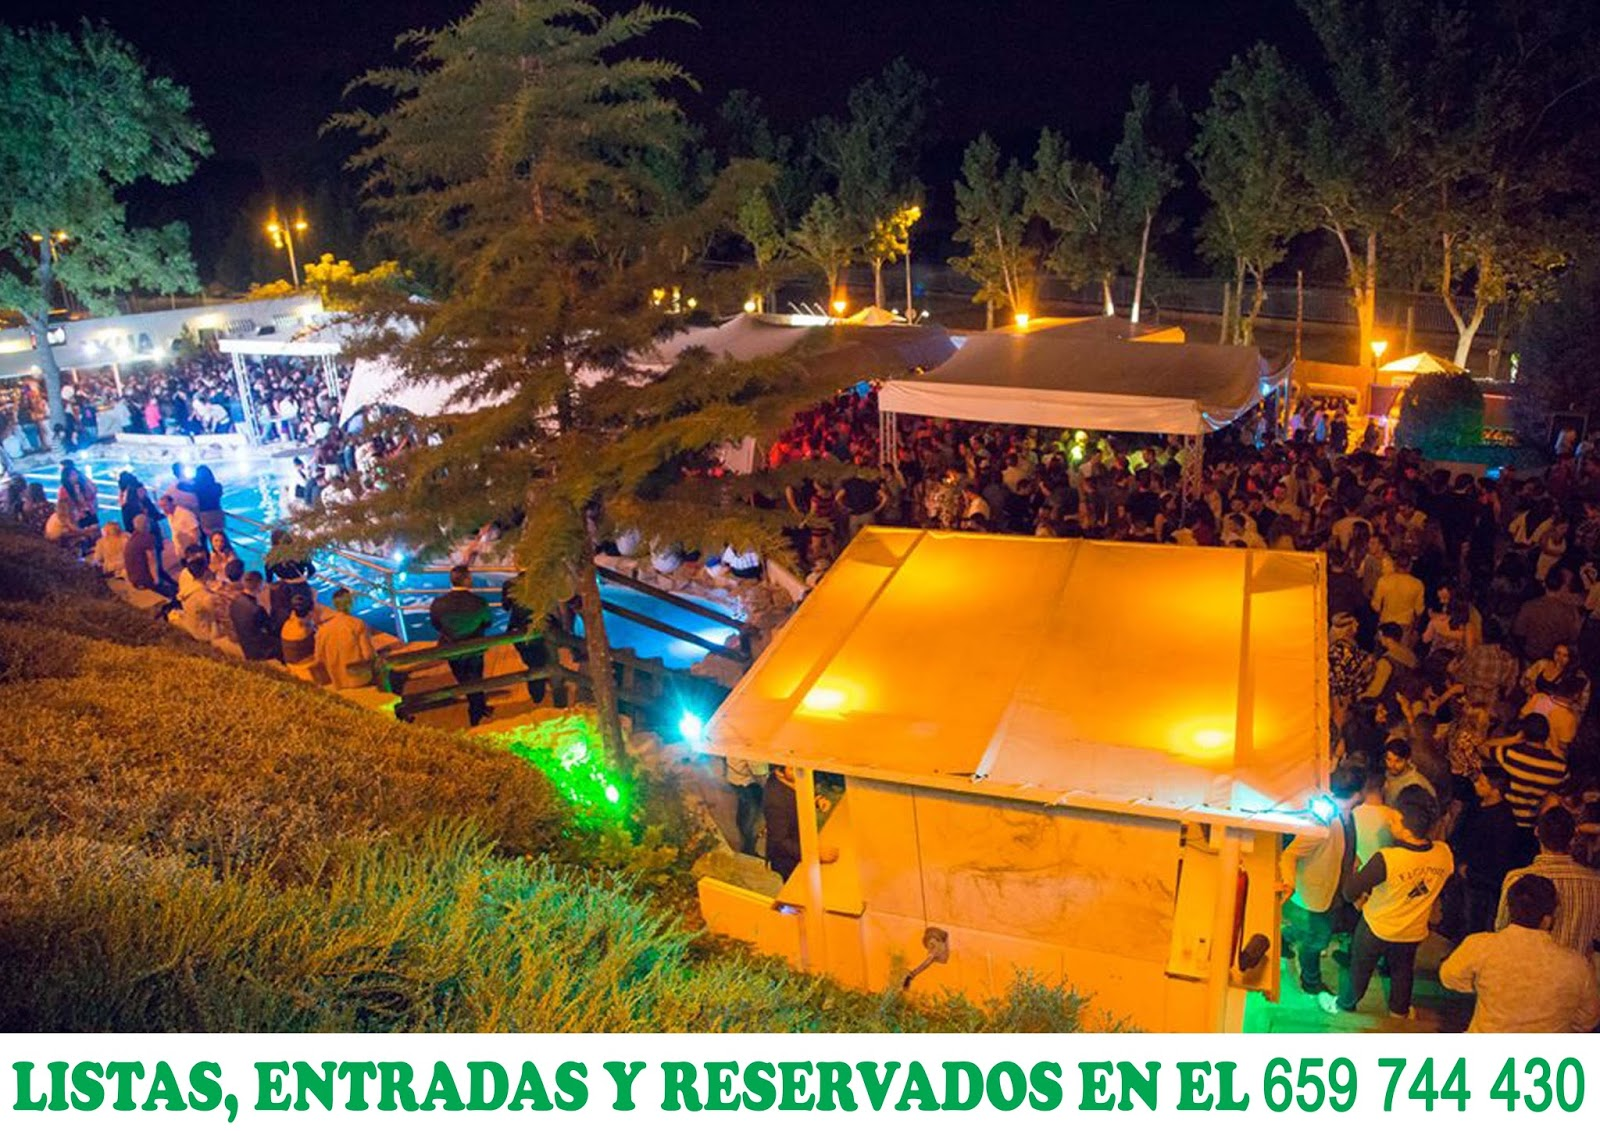 Rr pp discoteca terraza akua madrid lista discoteca terraza de verano akua madrid 659 744 430 - Casa lista madrid ...